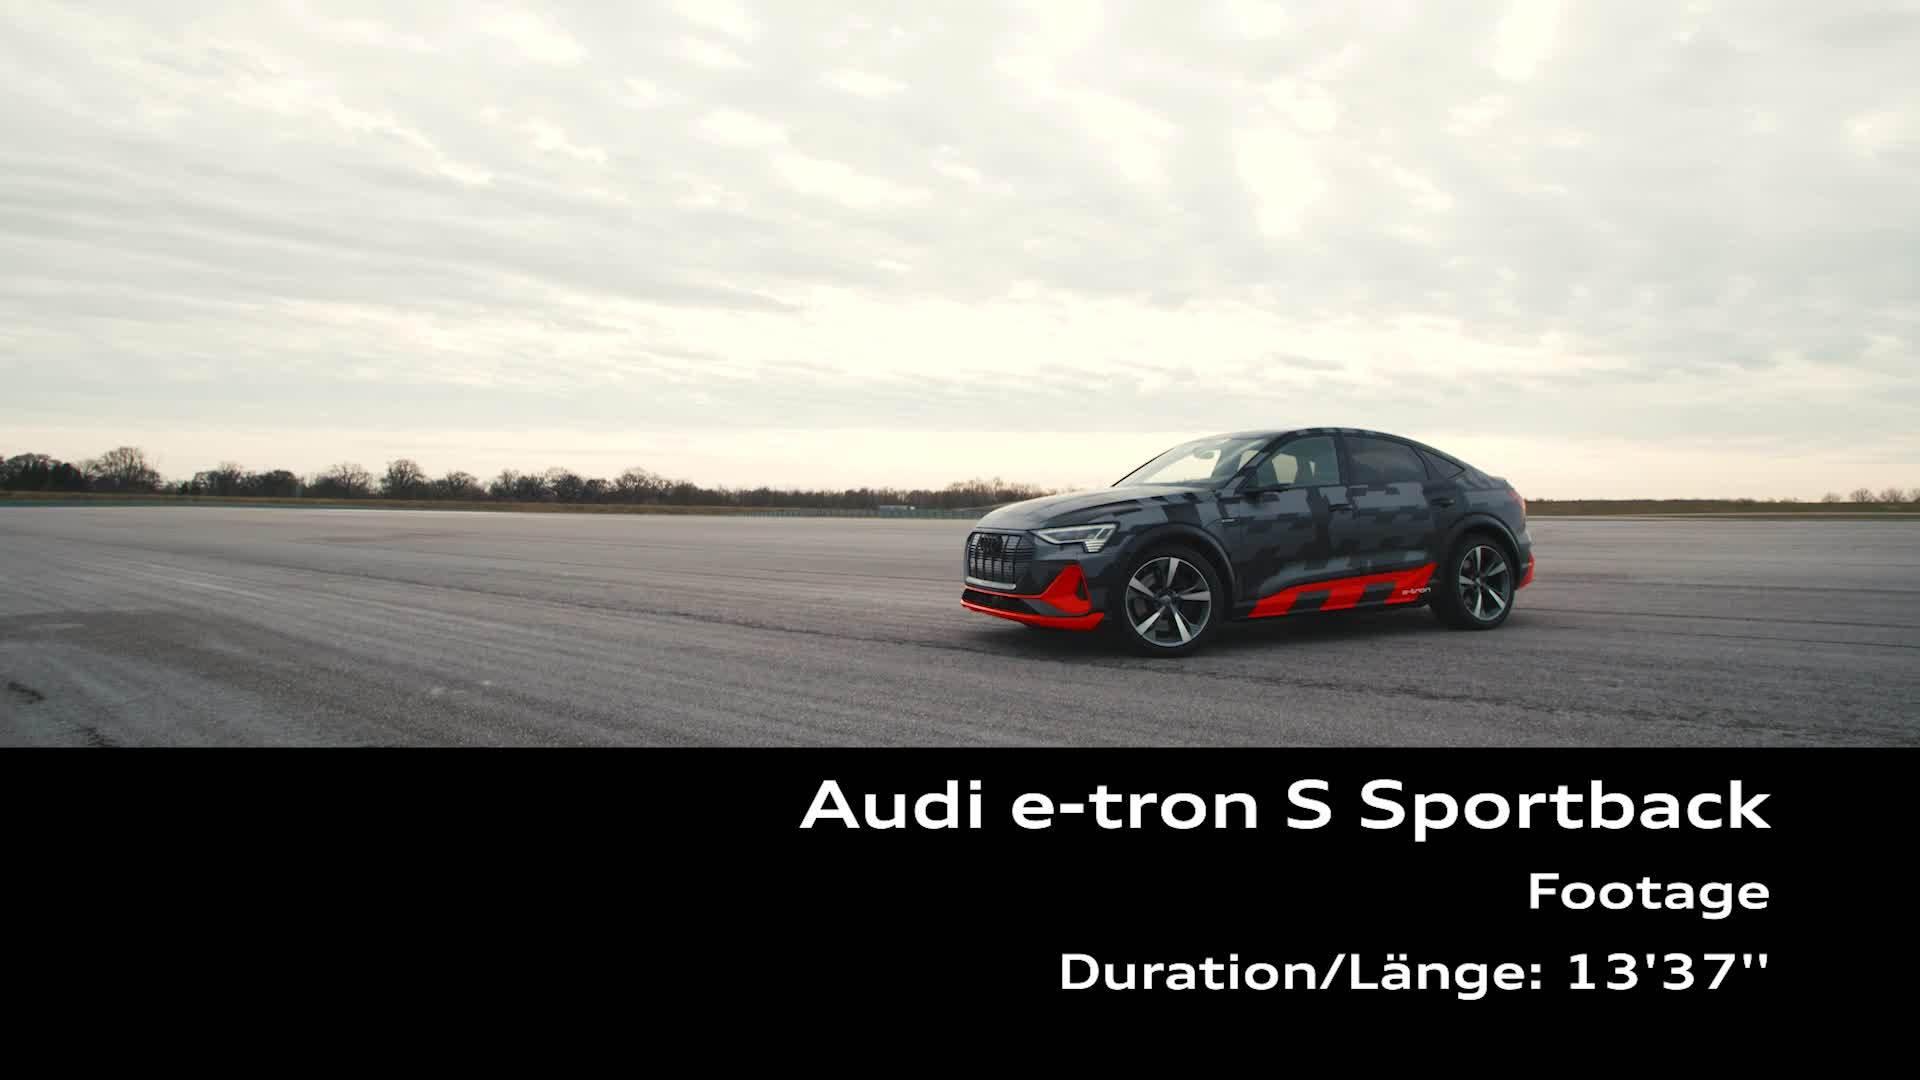 Footage: Audi e-tron S Sportback auf der Audi driving experience in Neuburg a.D.